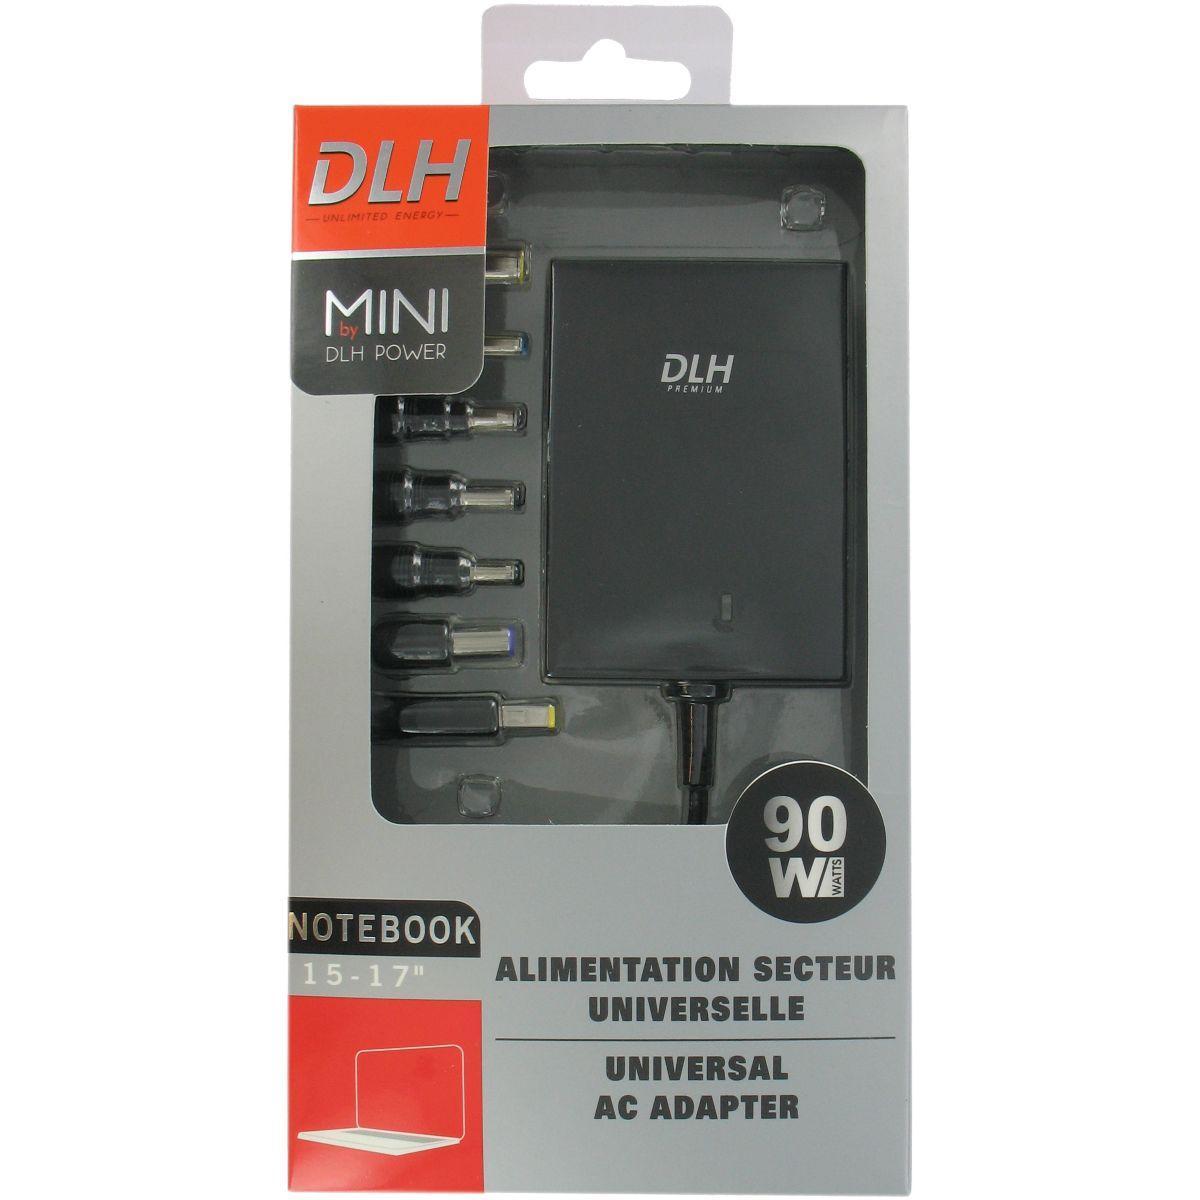 Alim dlh mini 90w notebook universelle - livraison offerte : code liv (photo)